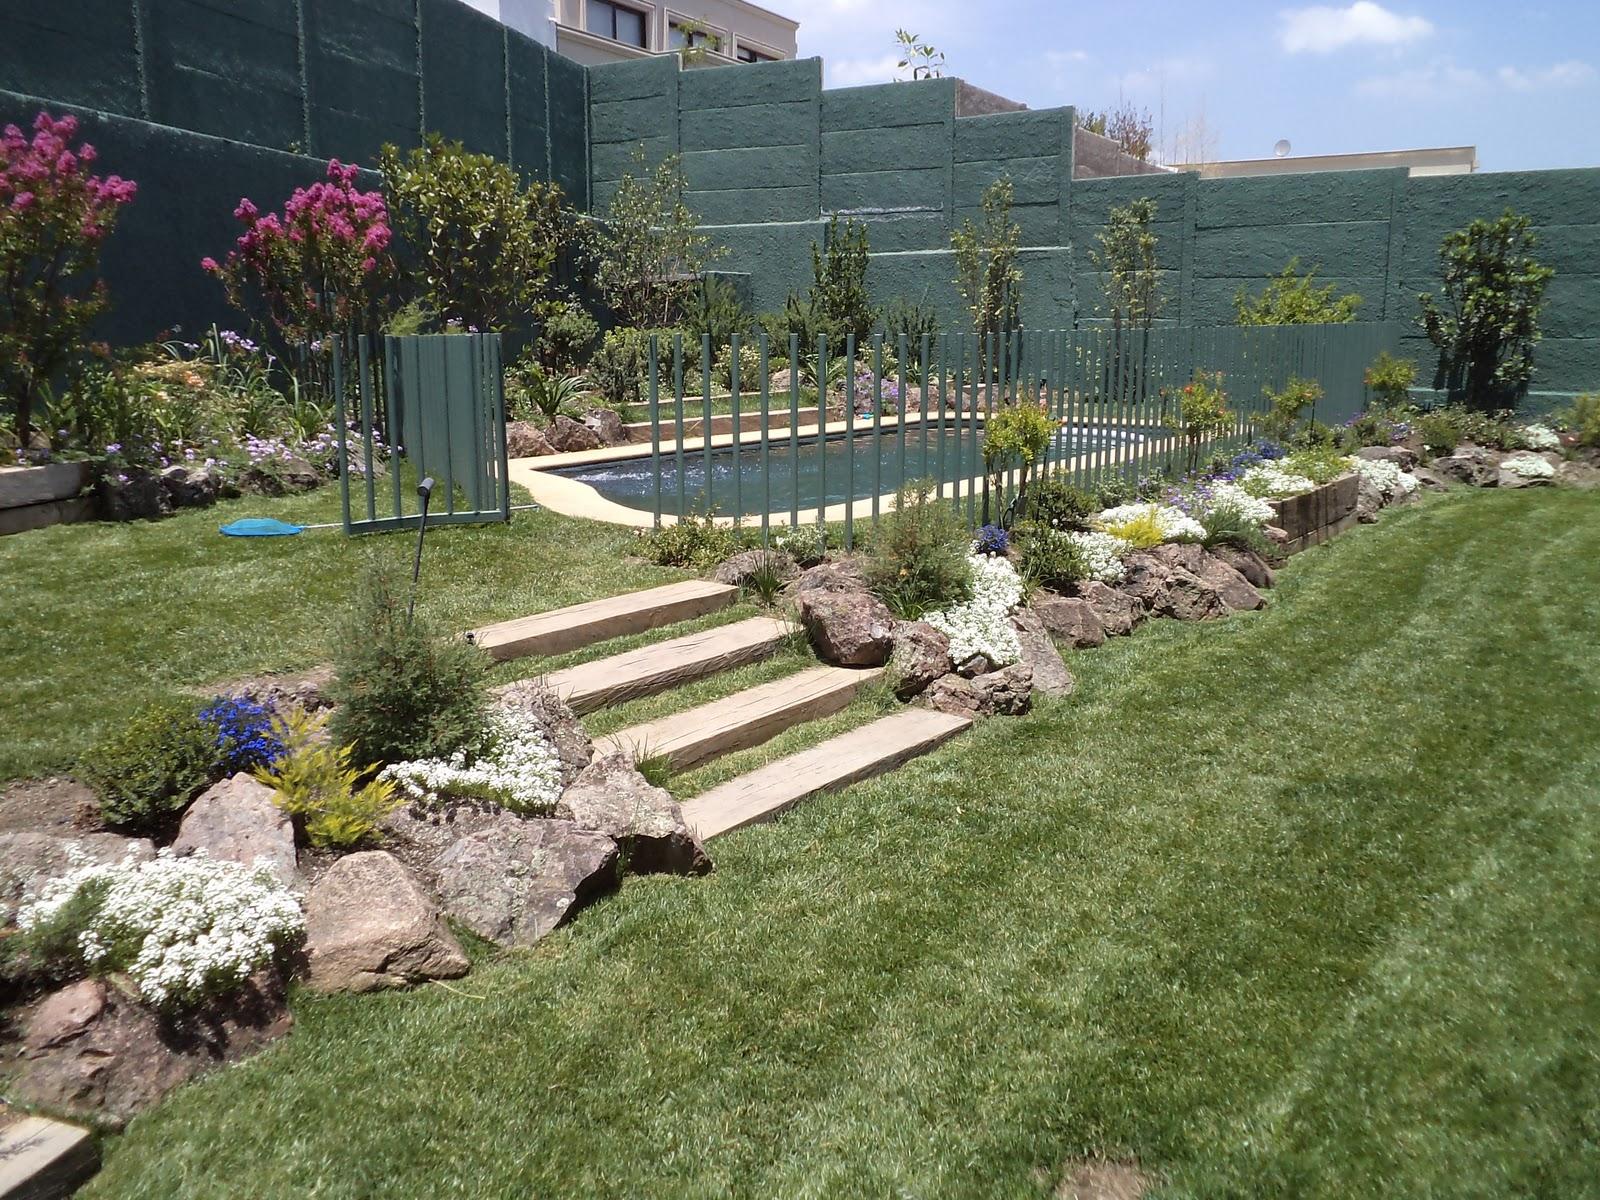 El zohar paisajismo gilda herrera paisajismo con for Paisajismo jardines rusticos